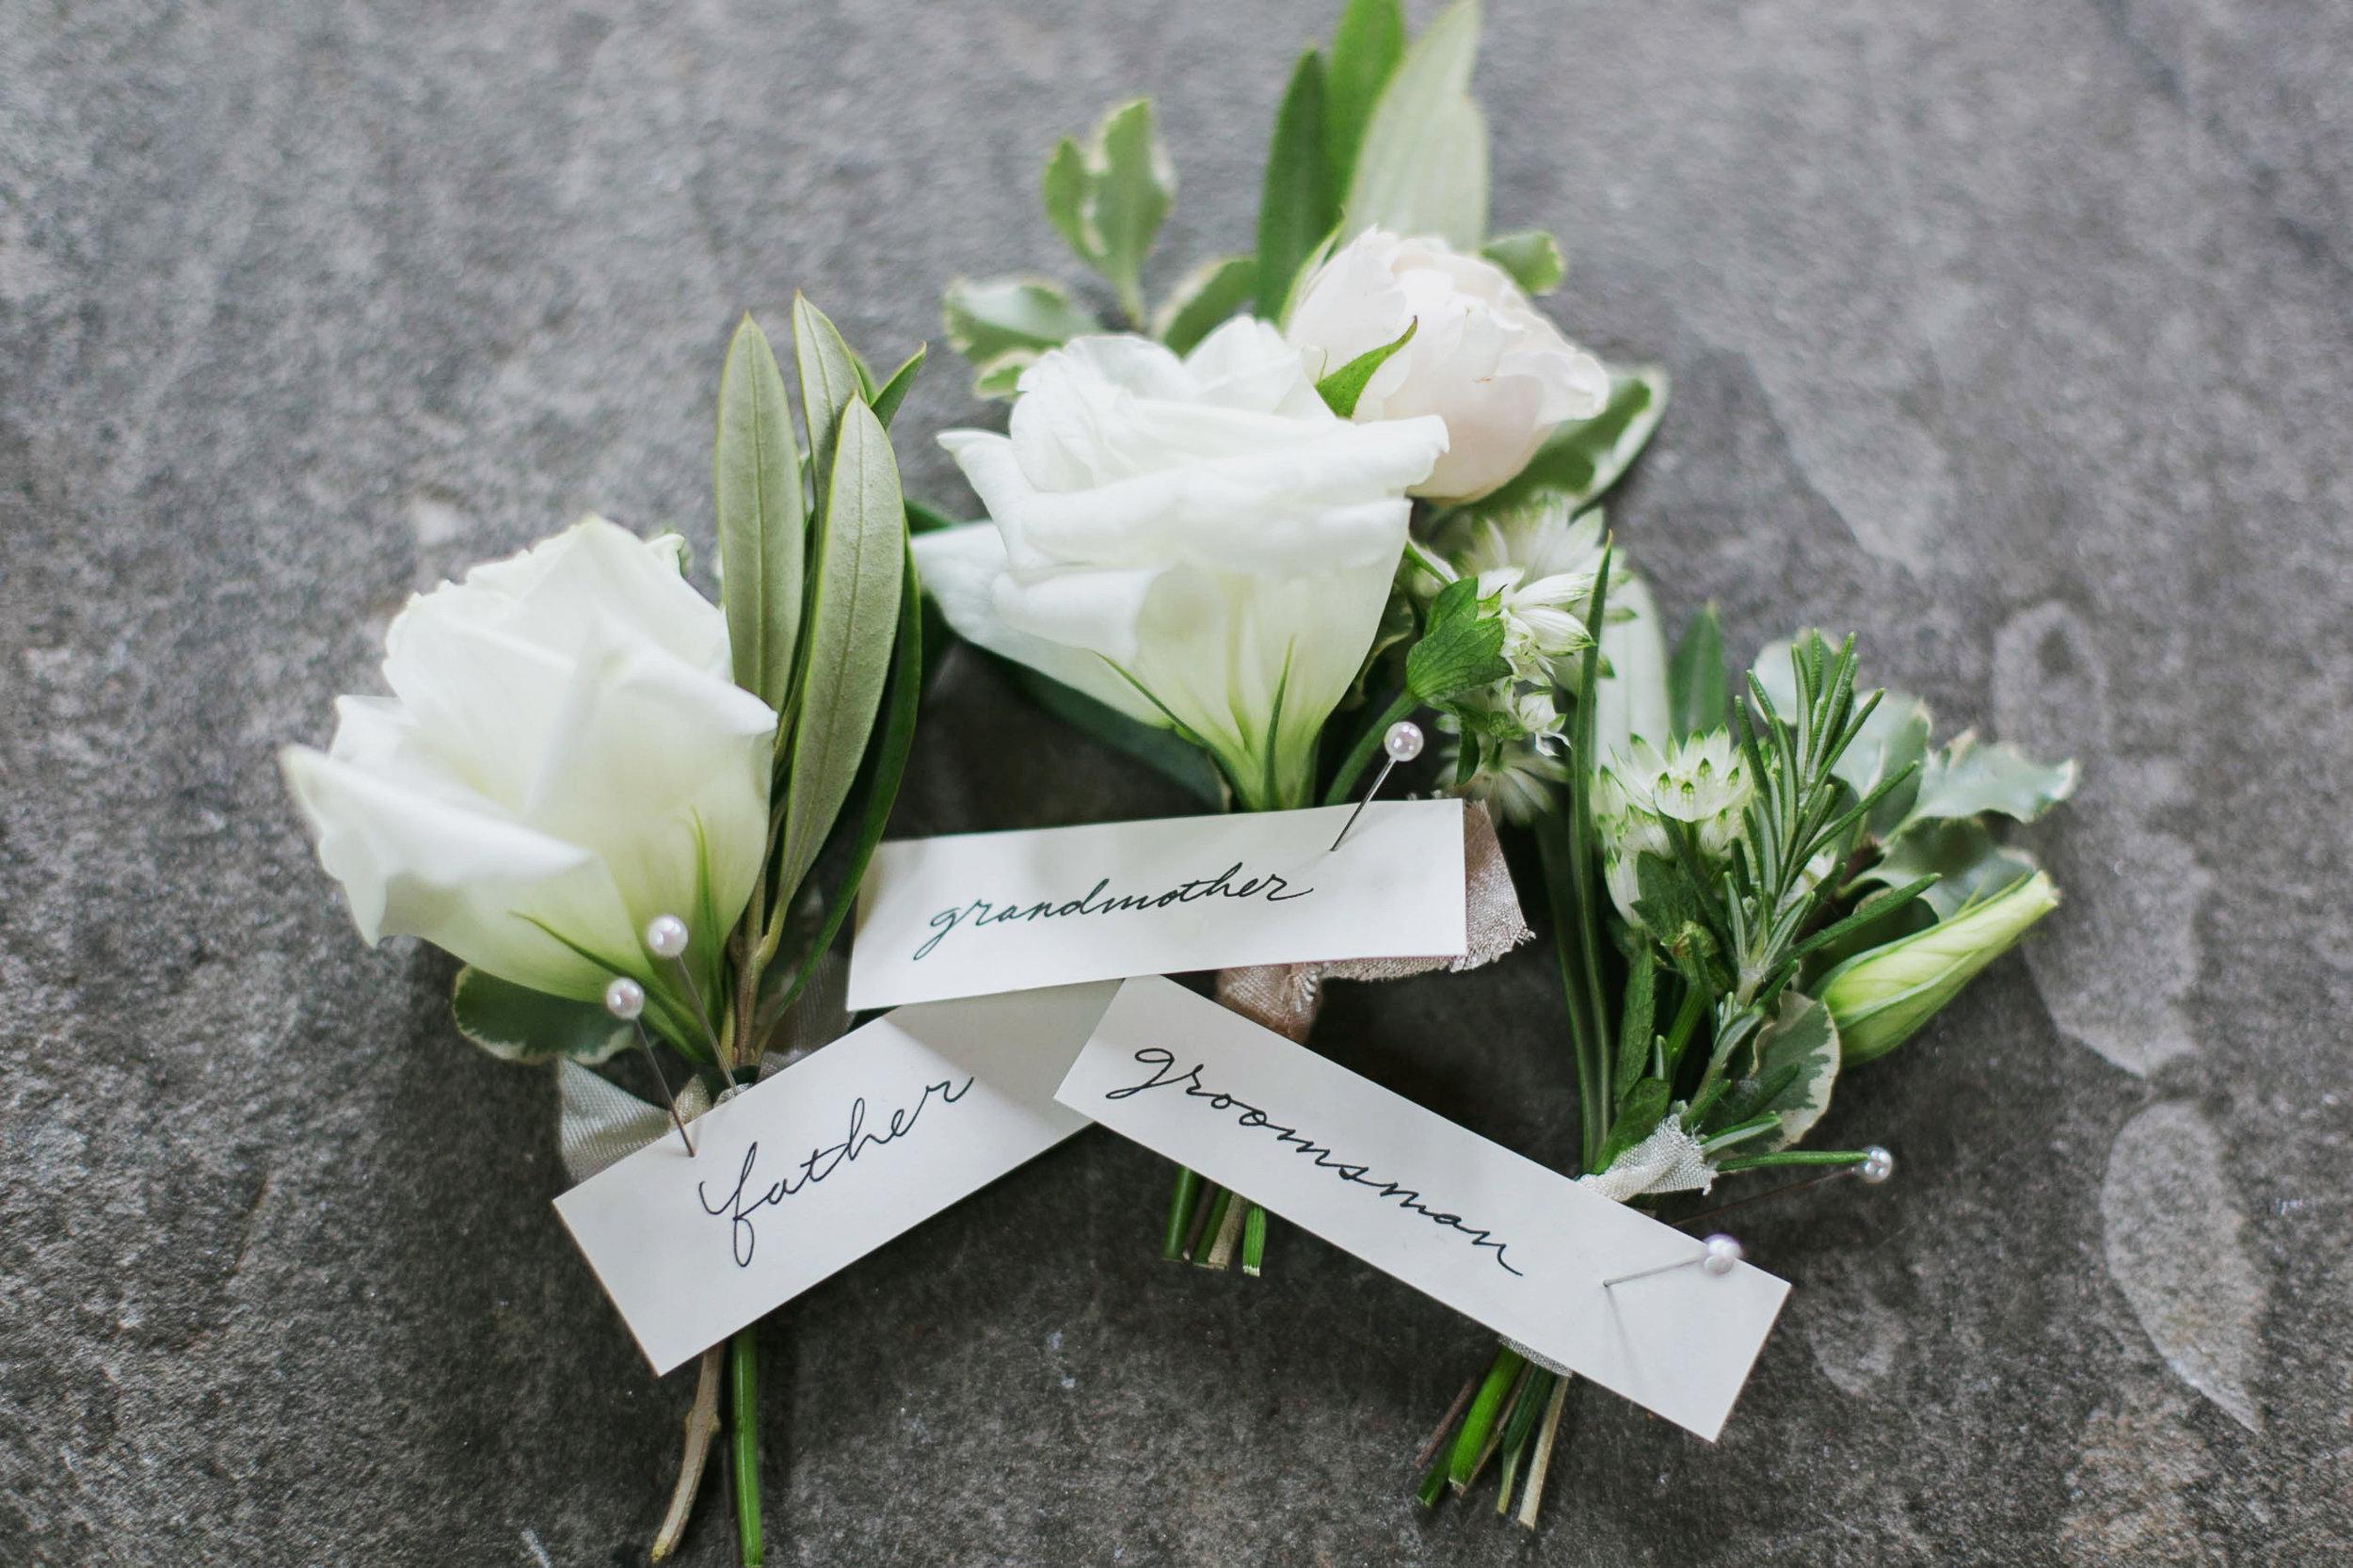 Simply-Charming-Socials_Atlanta-Wedding-Planner_Our-Labor-Of-Love_Emily-and-Jon_1.jpg